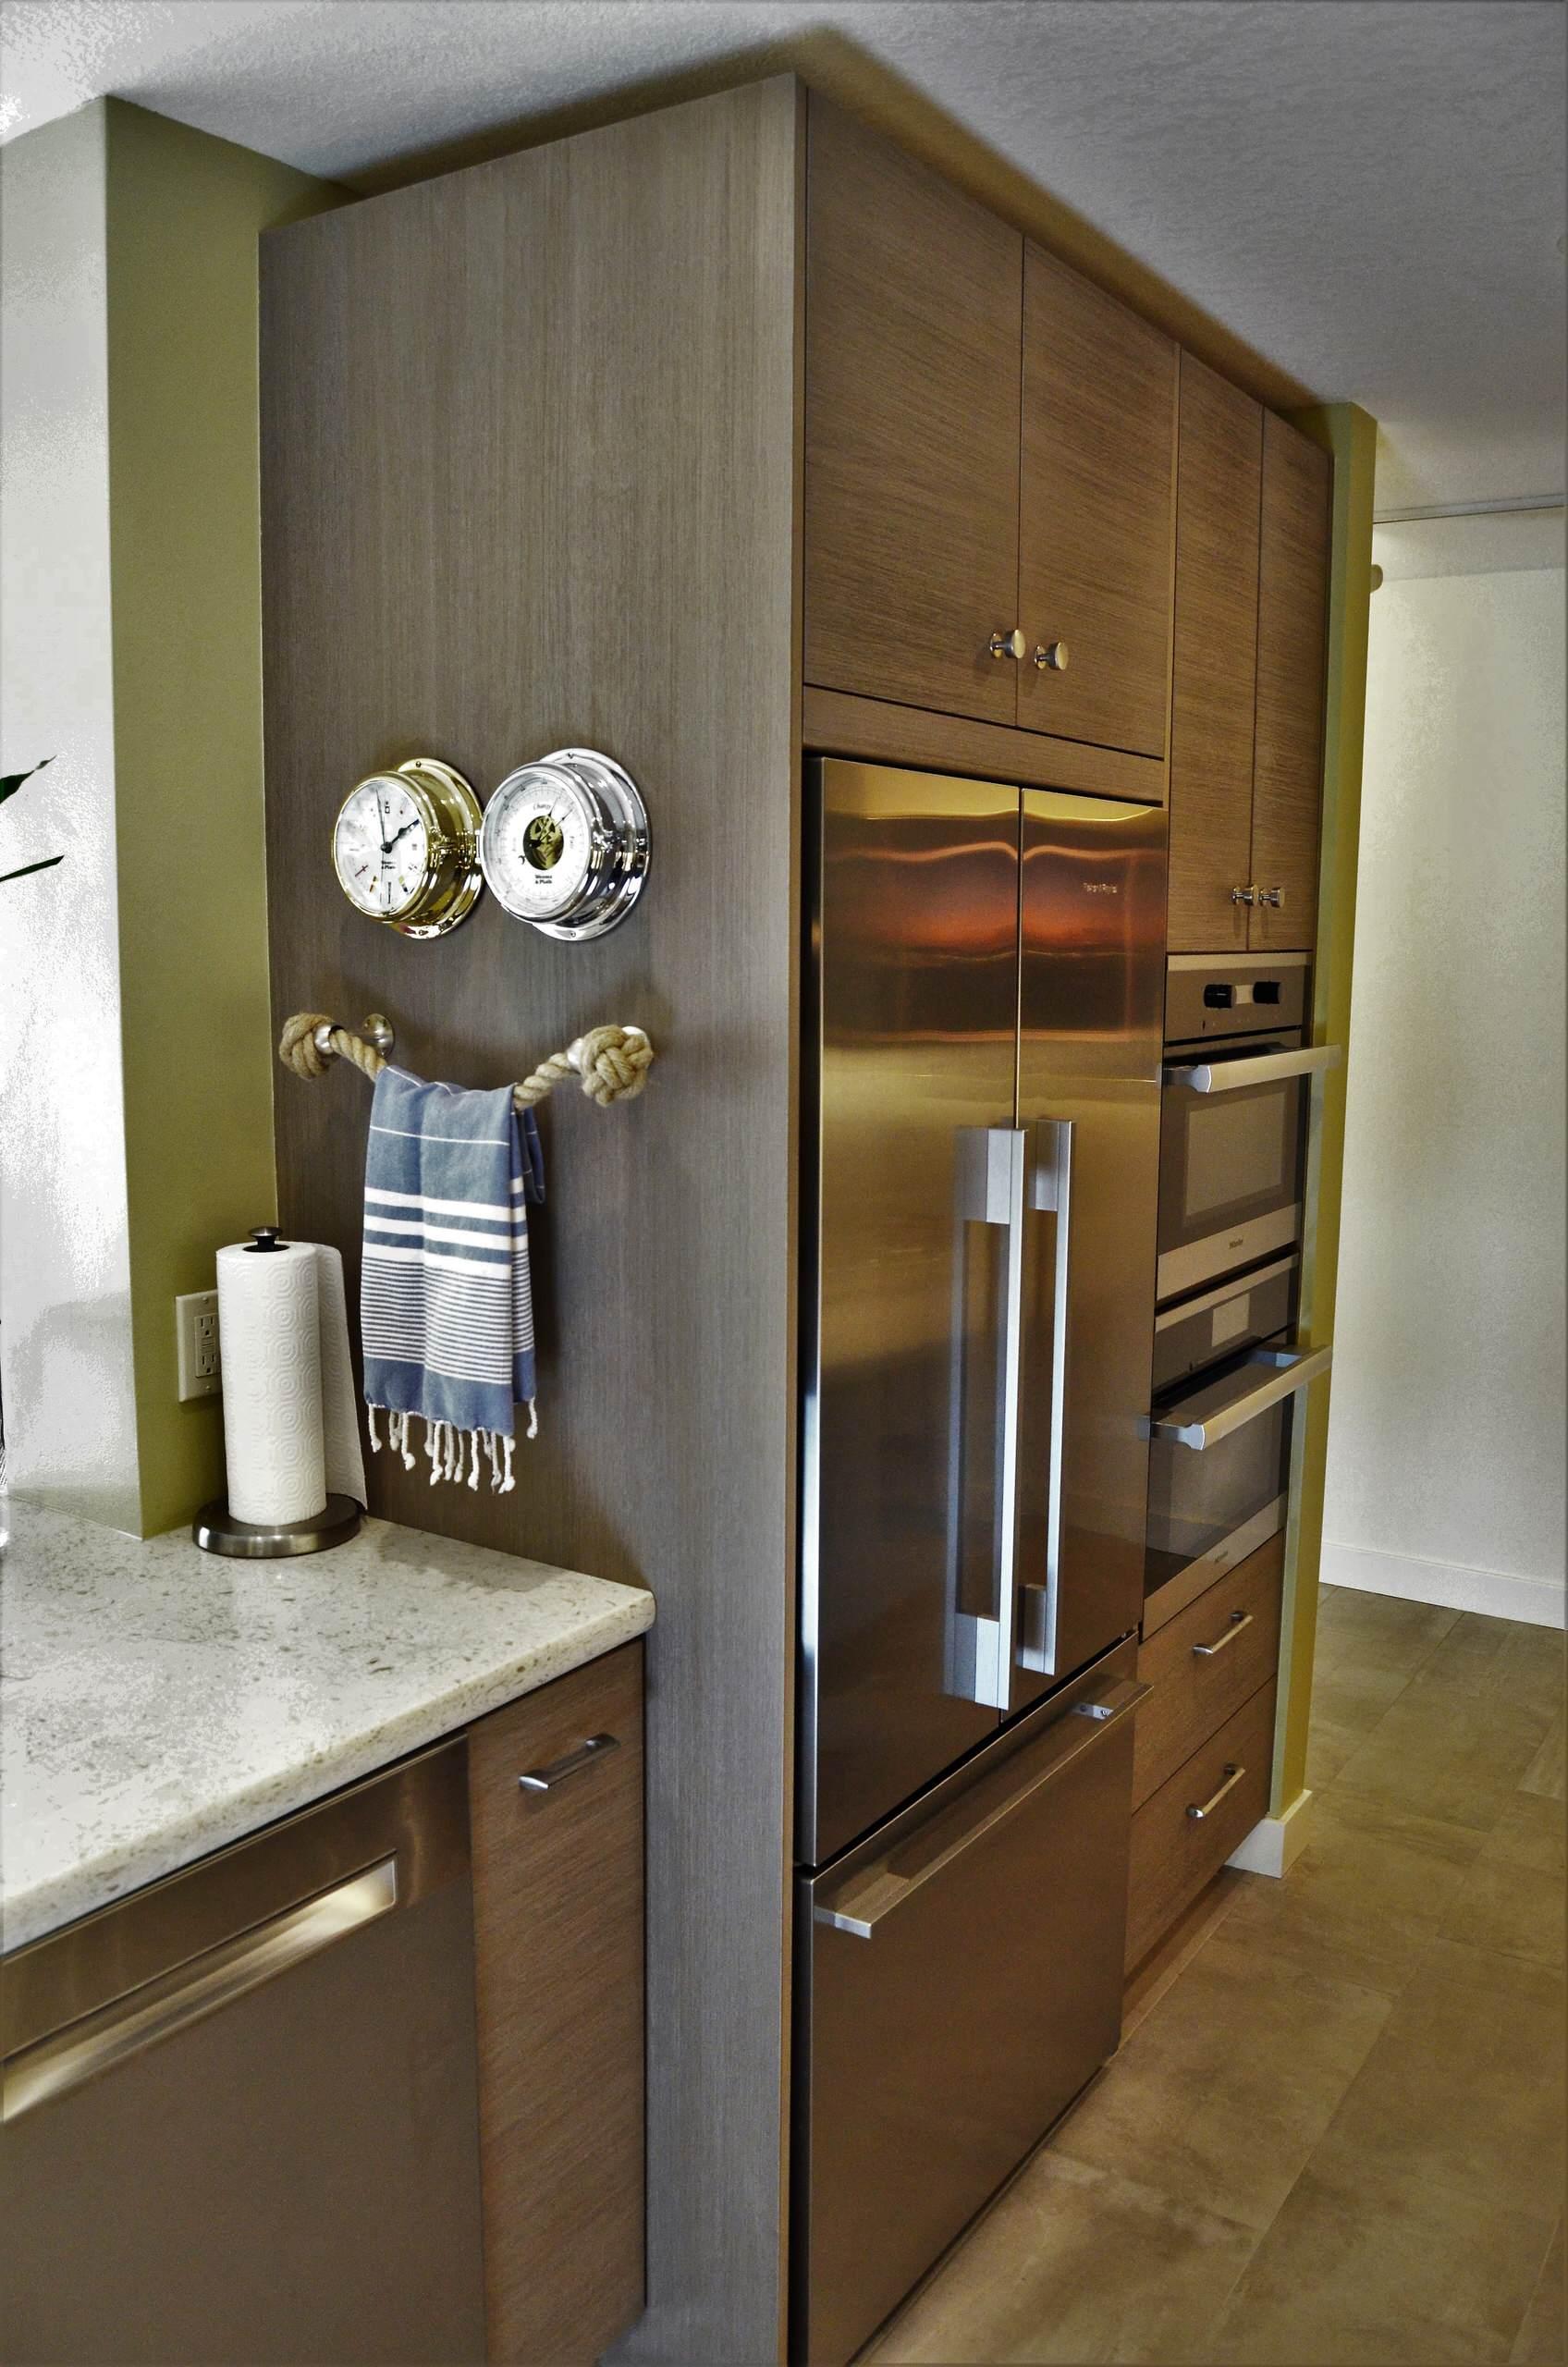 Coastal Contemporary - Kitchen